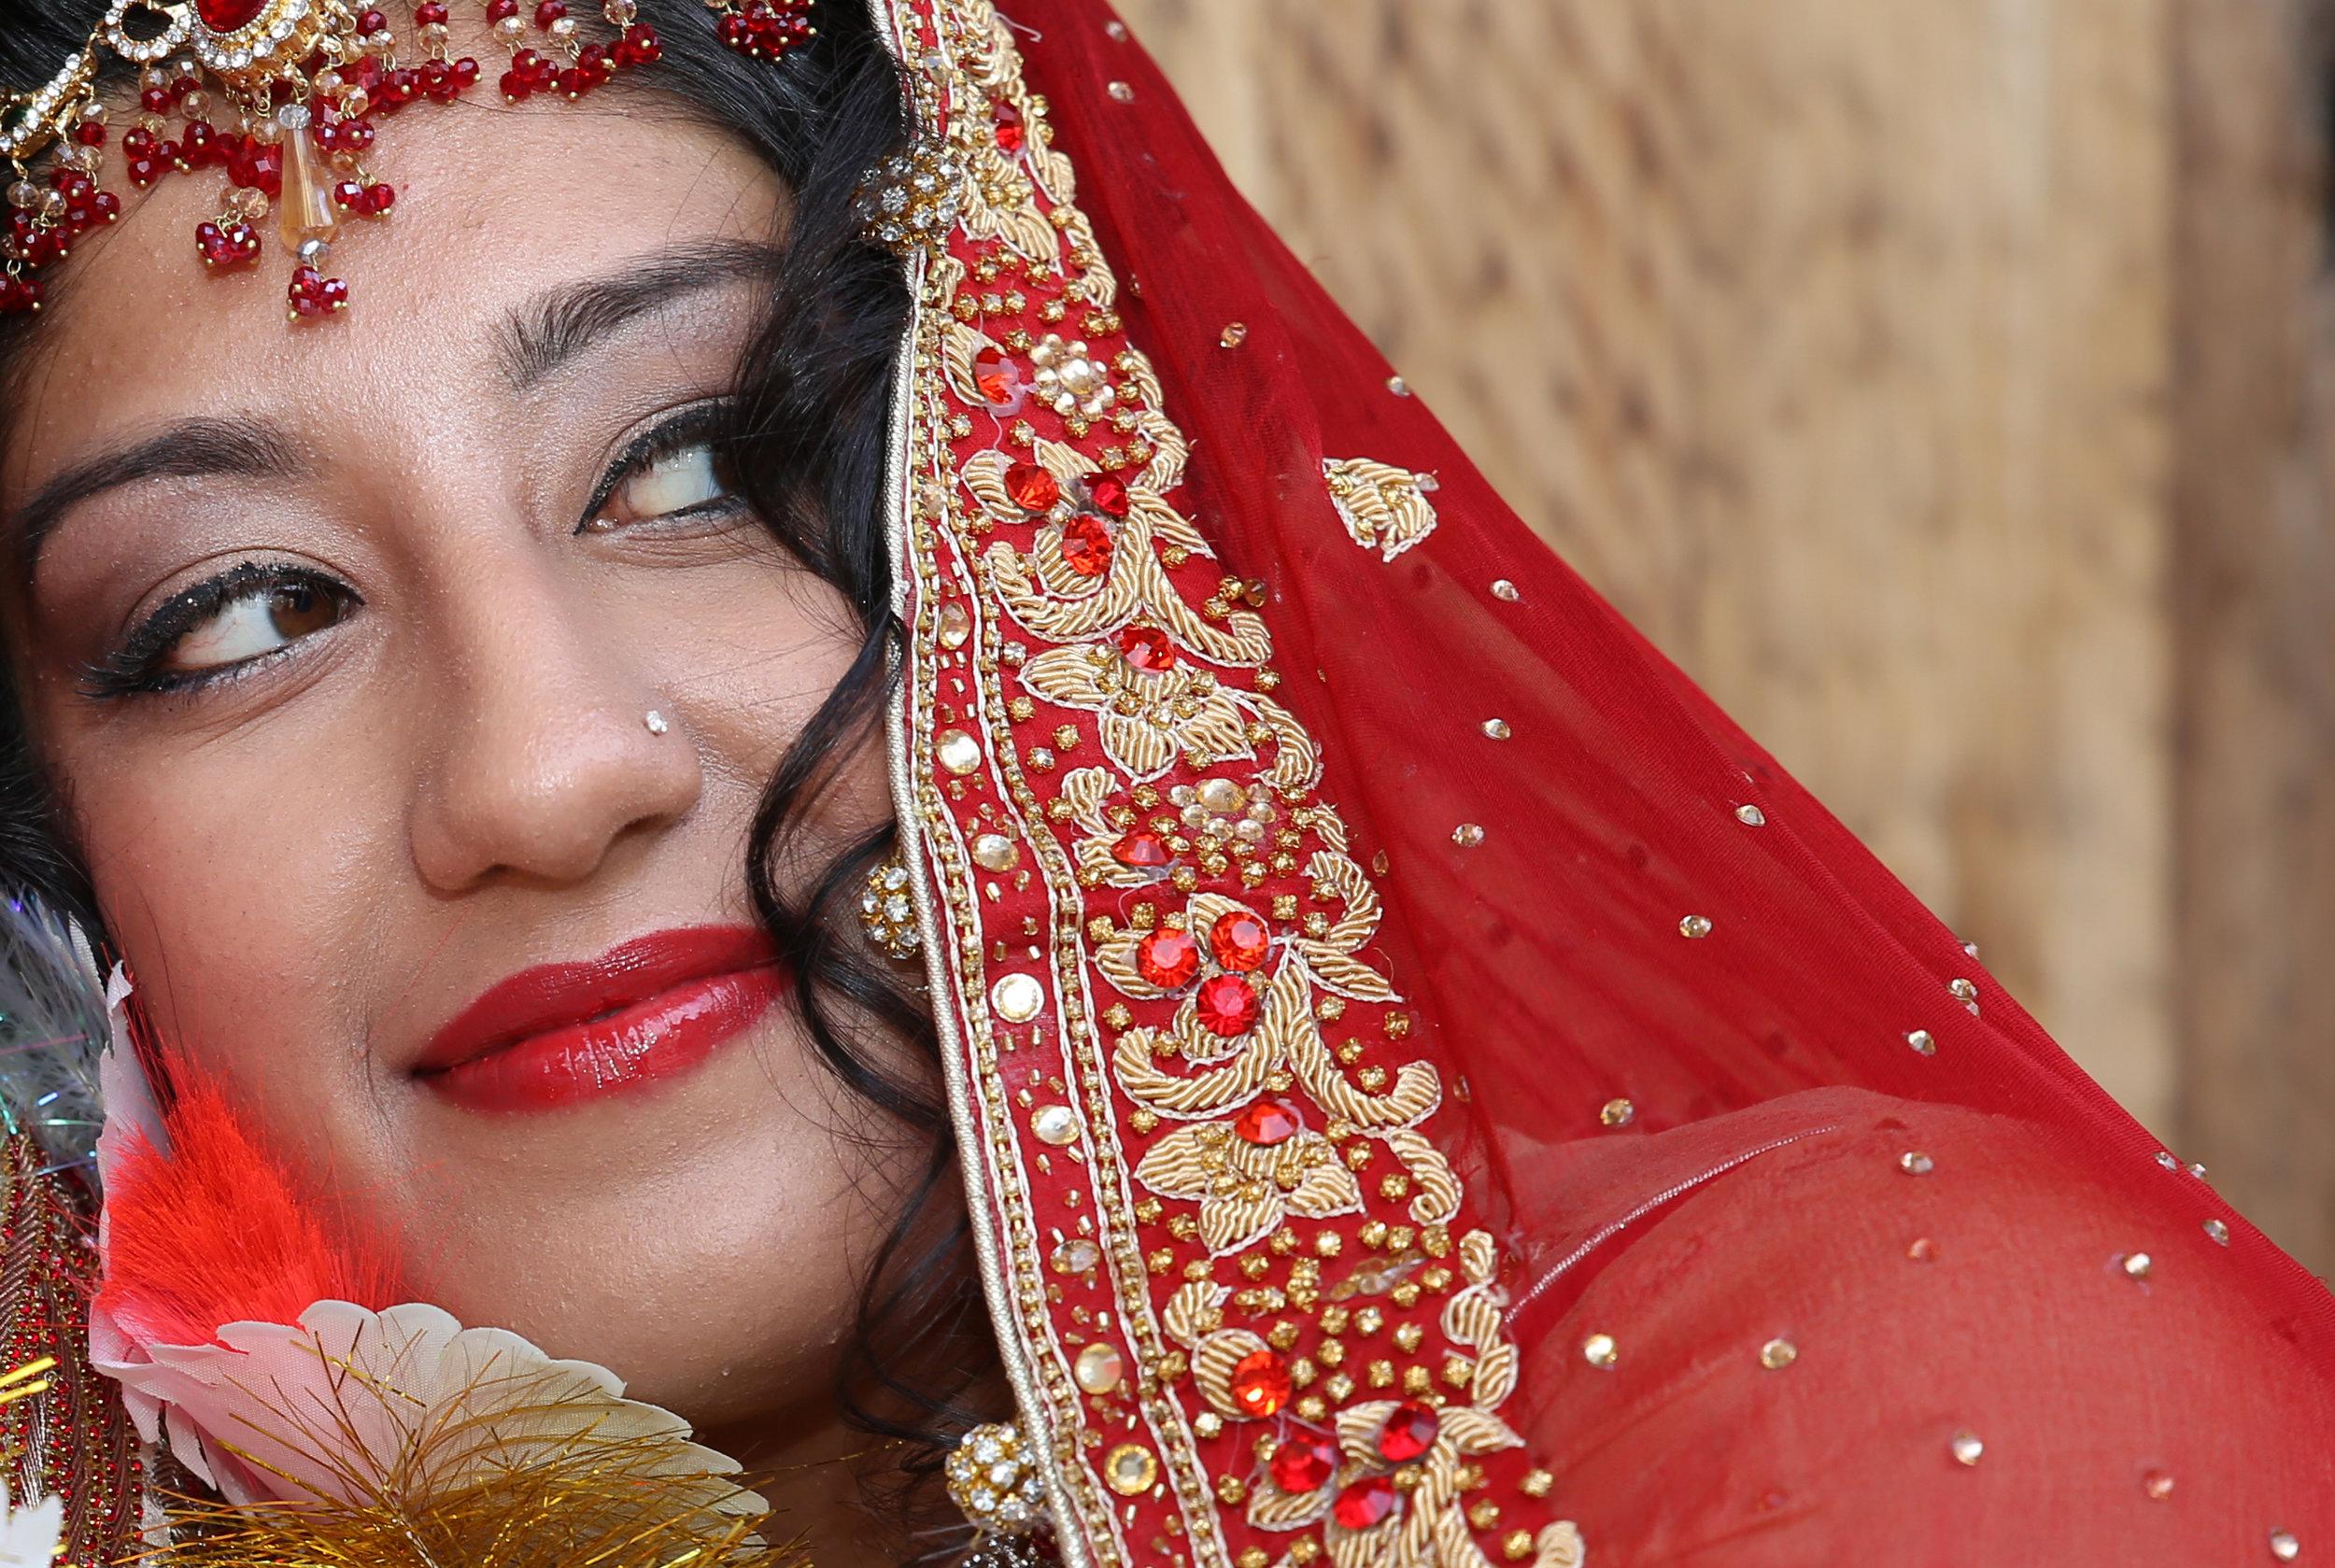 middle eastern wedding 4.jpg